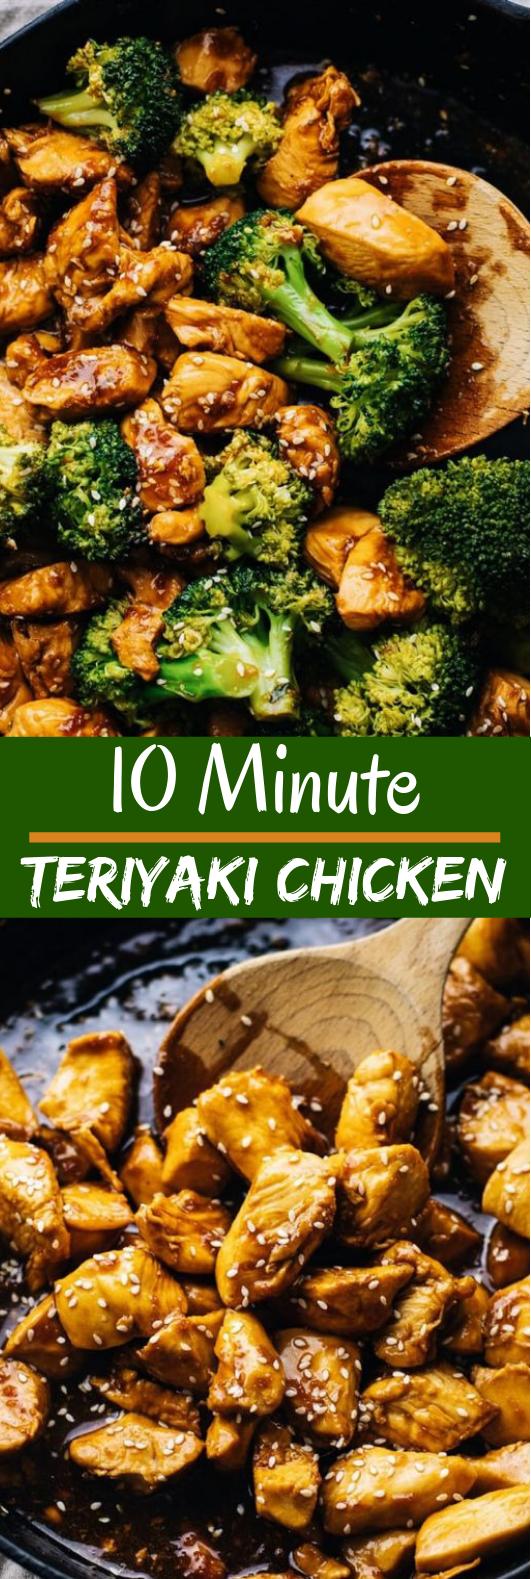 10-Minute Teriyaki Chicken #healthy #lunch